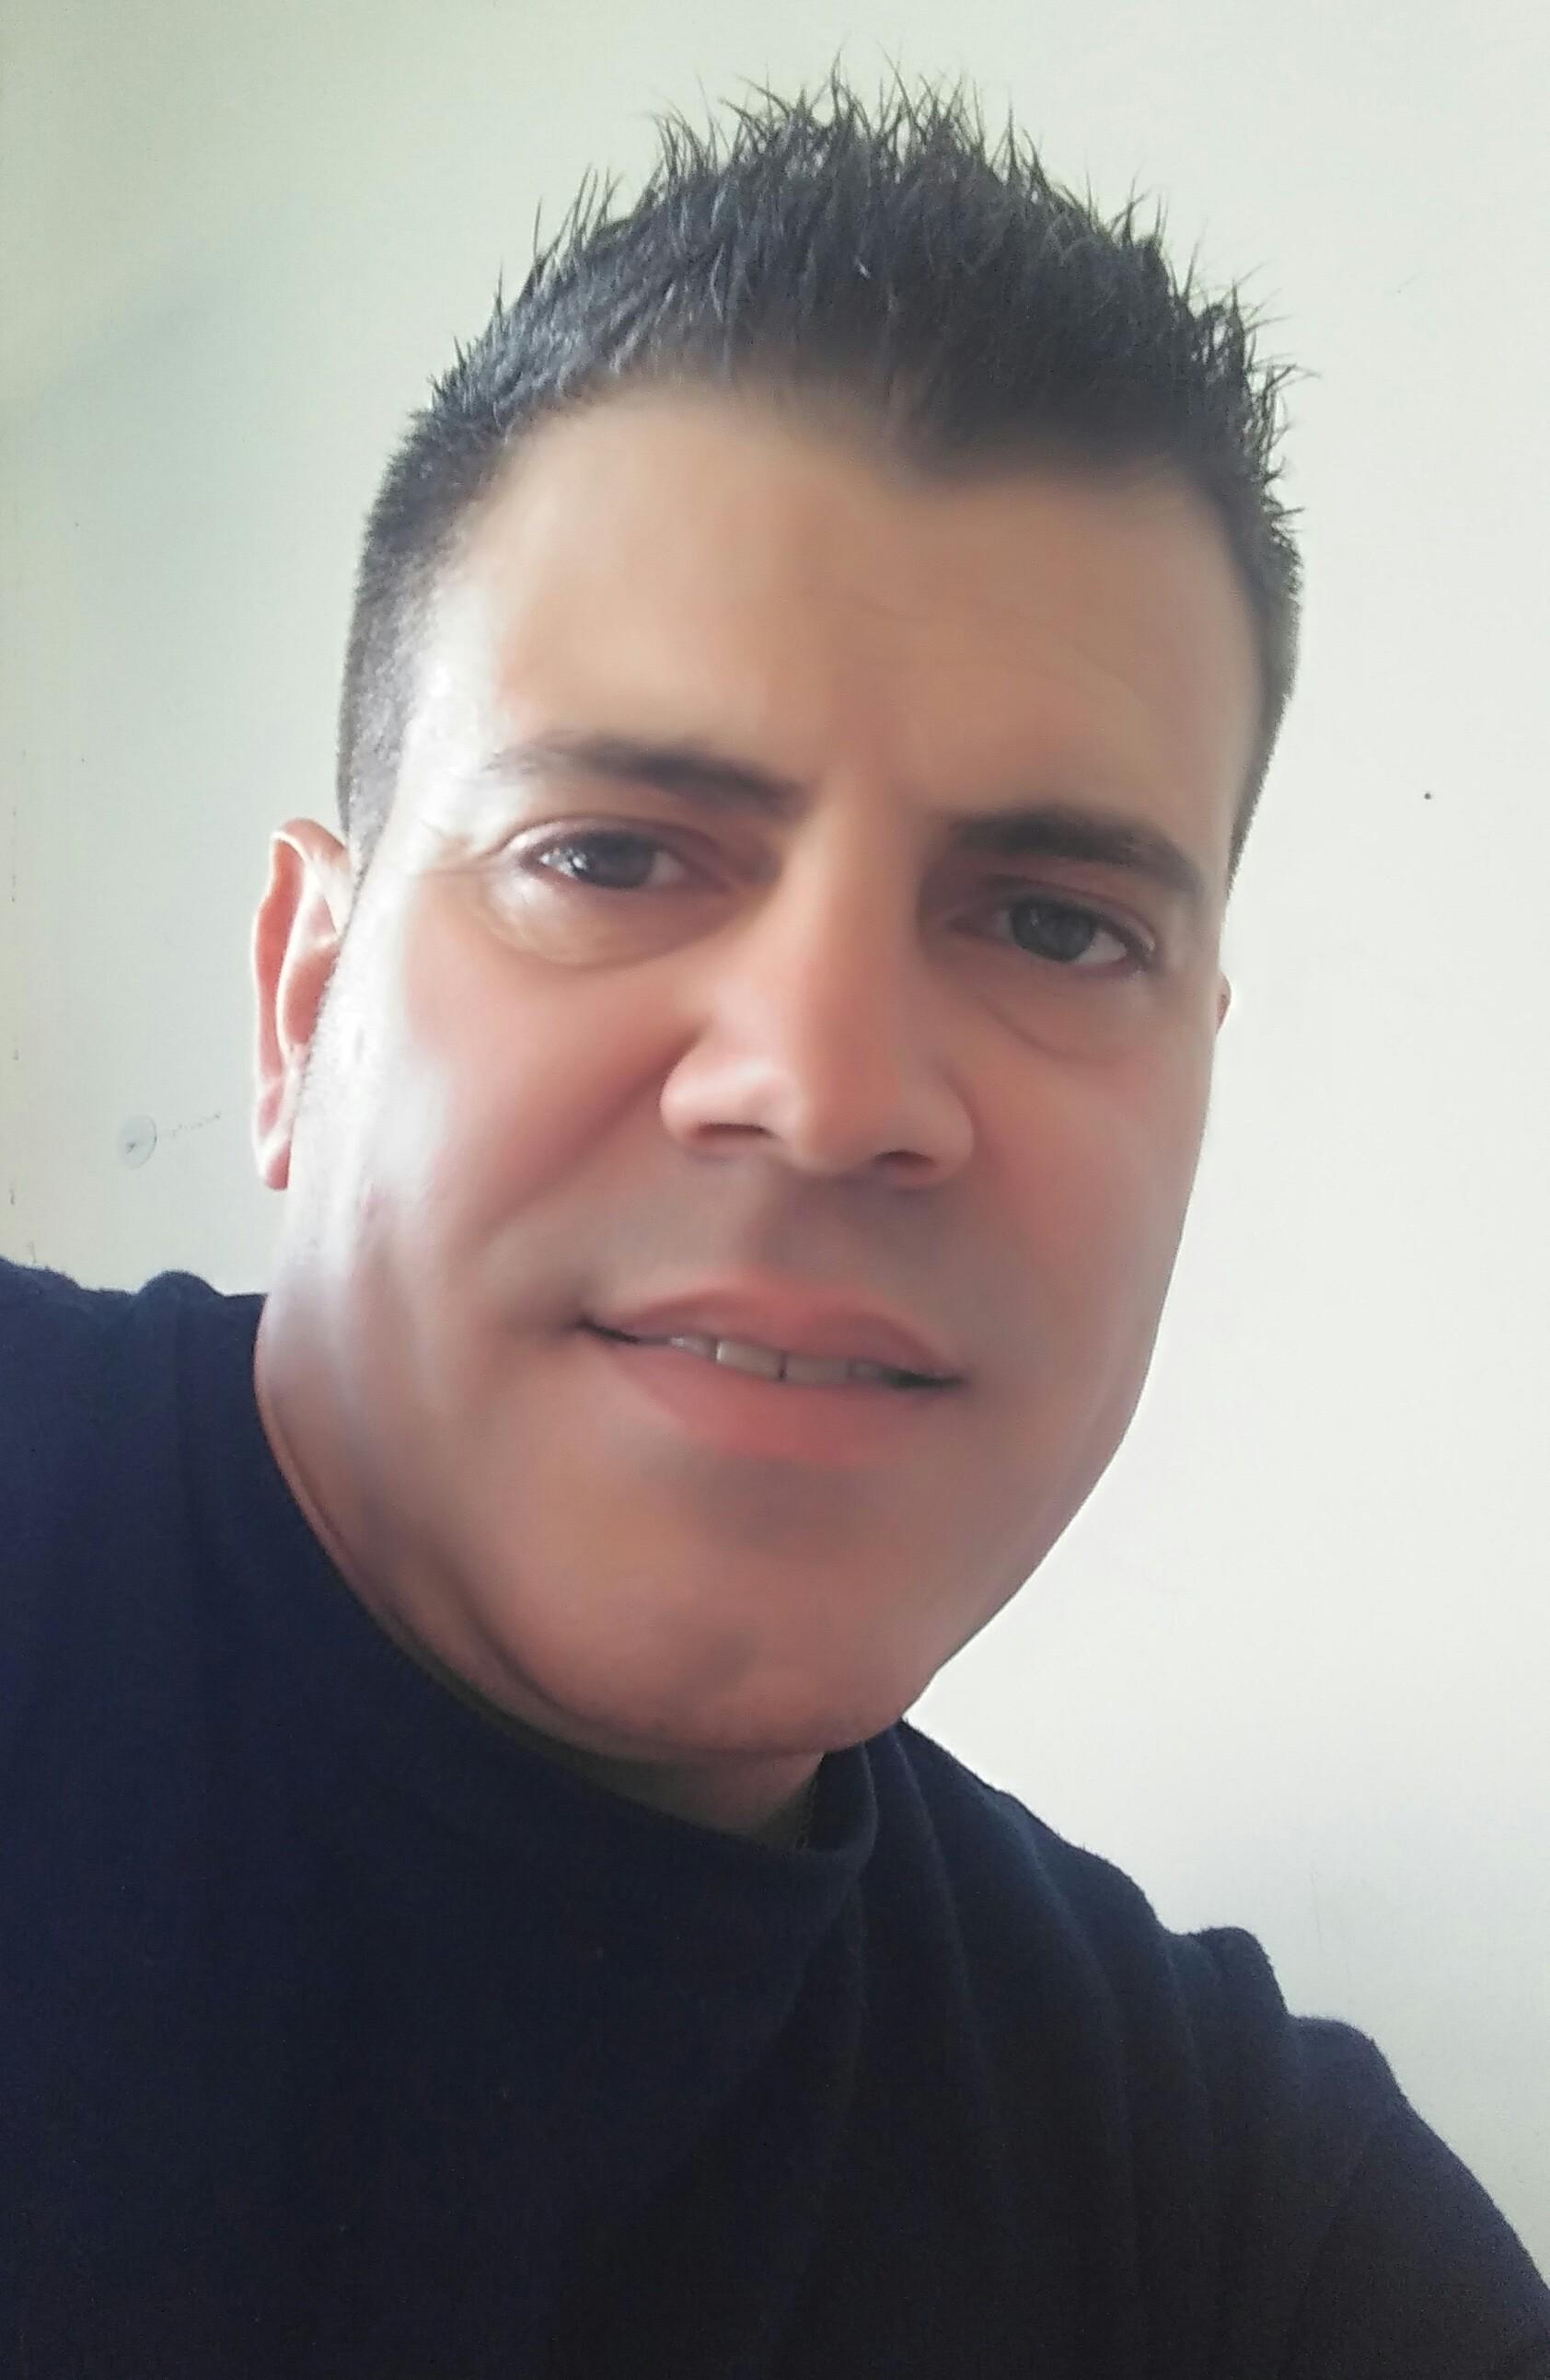 Arturo Morelli